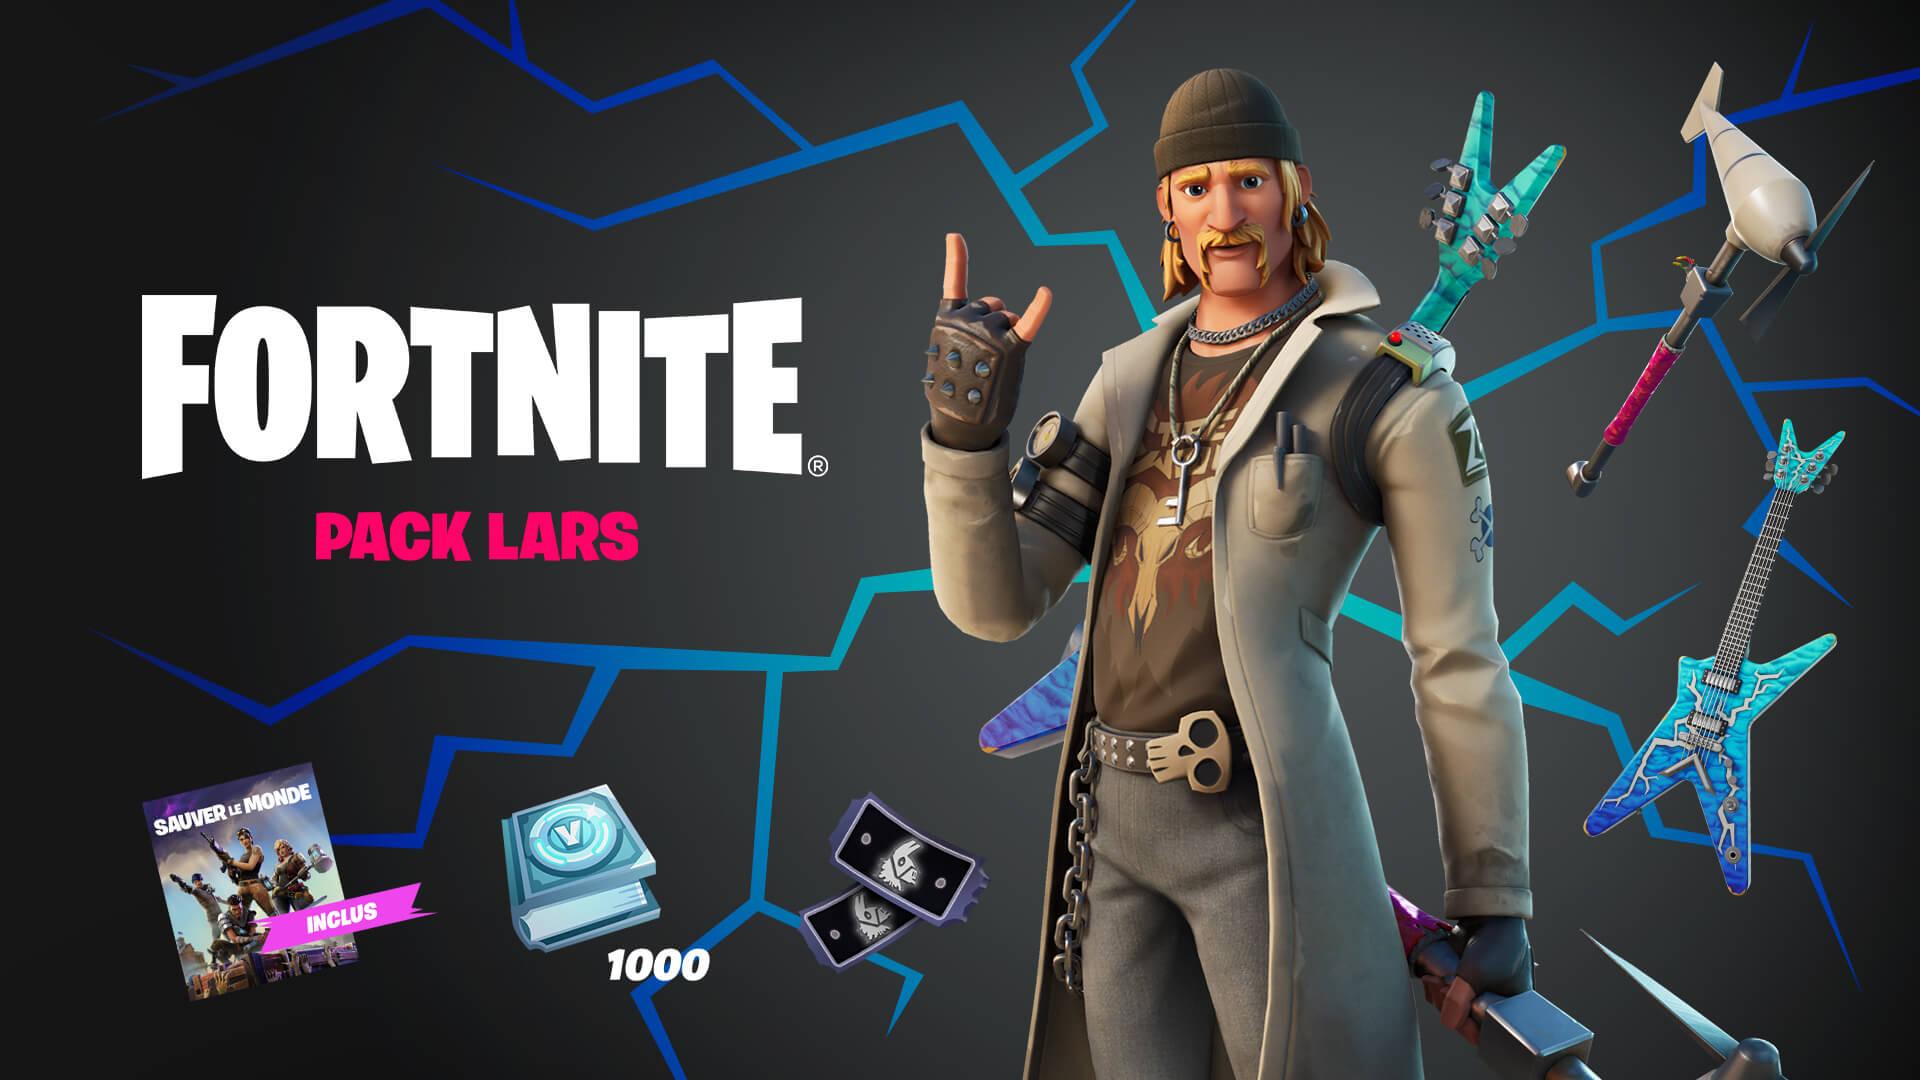 FR Fortnite Save the World Lars Pack